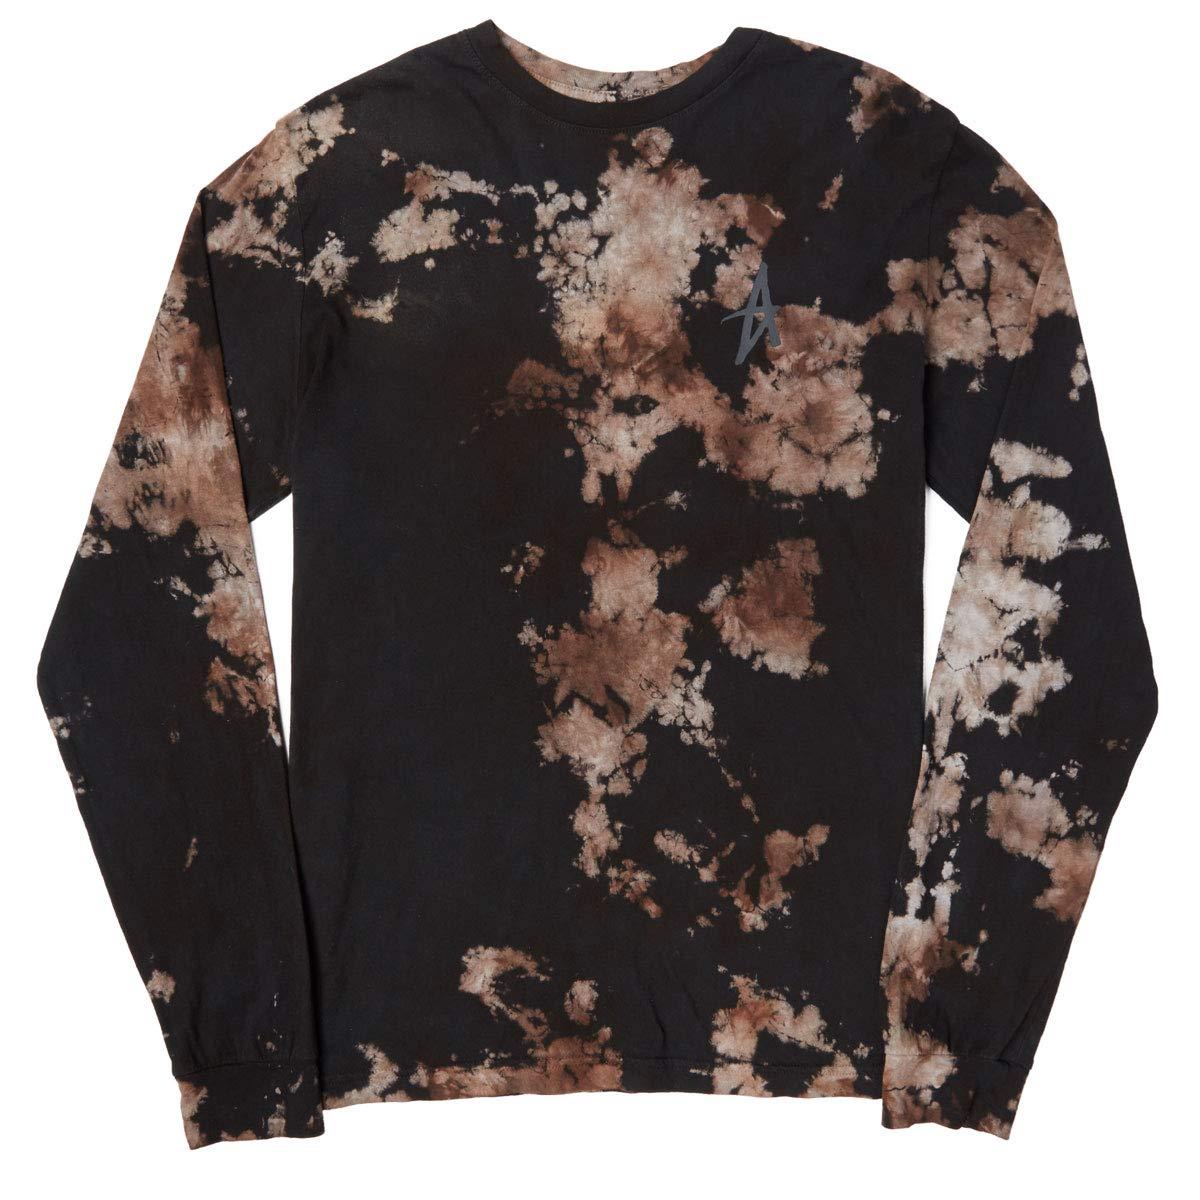 Volcom Piedra mortal básico para hombres Camiseta De Manga Larga-Negro Todas Las Tallas